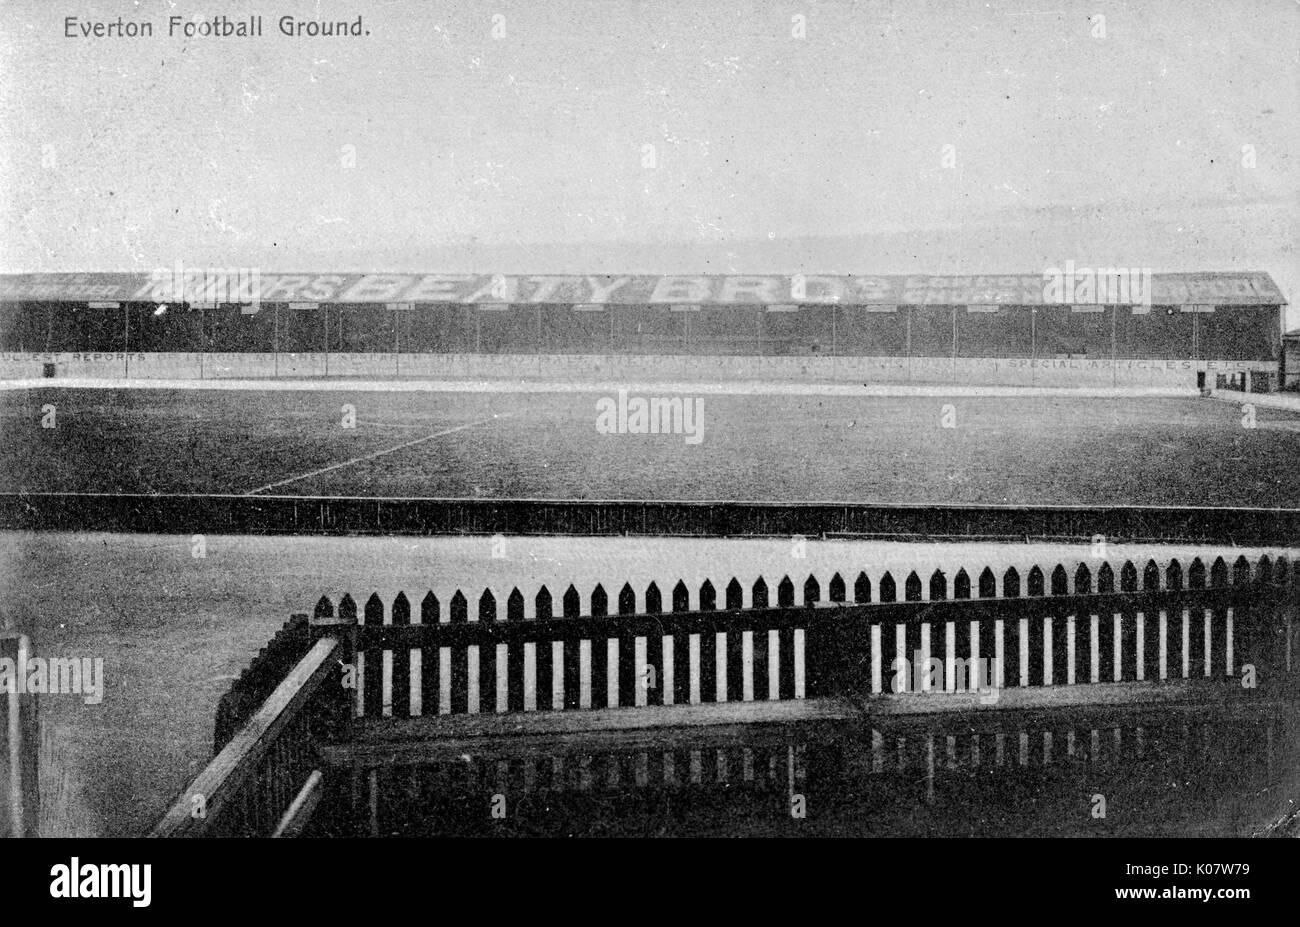 Terreno de Fútbol Everton, Liverpool. Fecha: circa 1910 Foto de stock